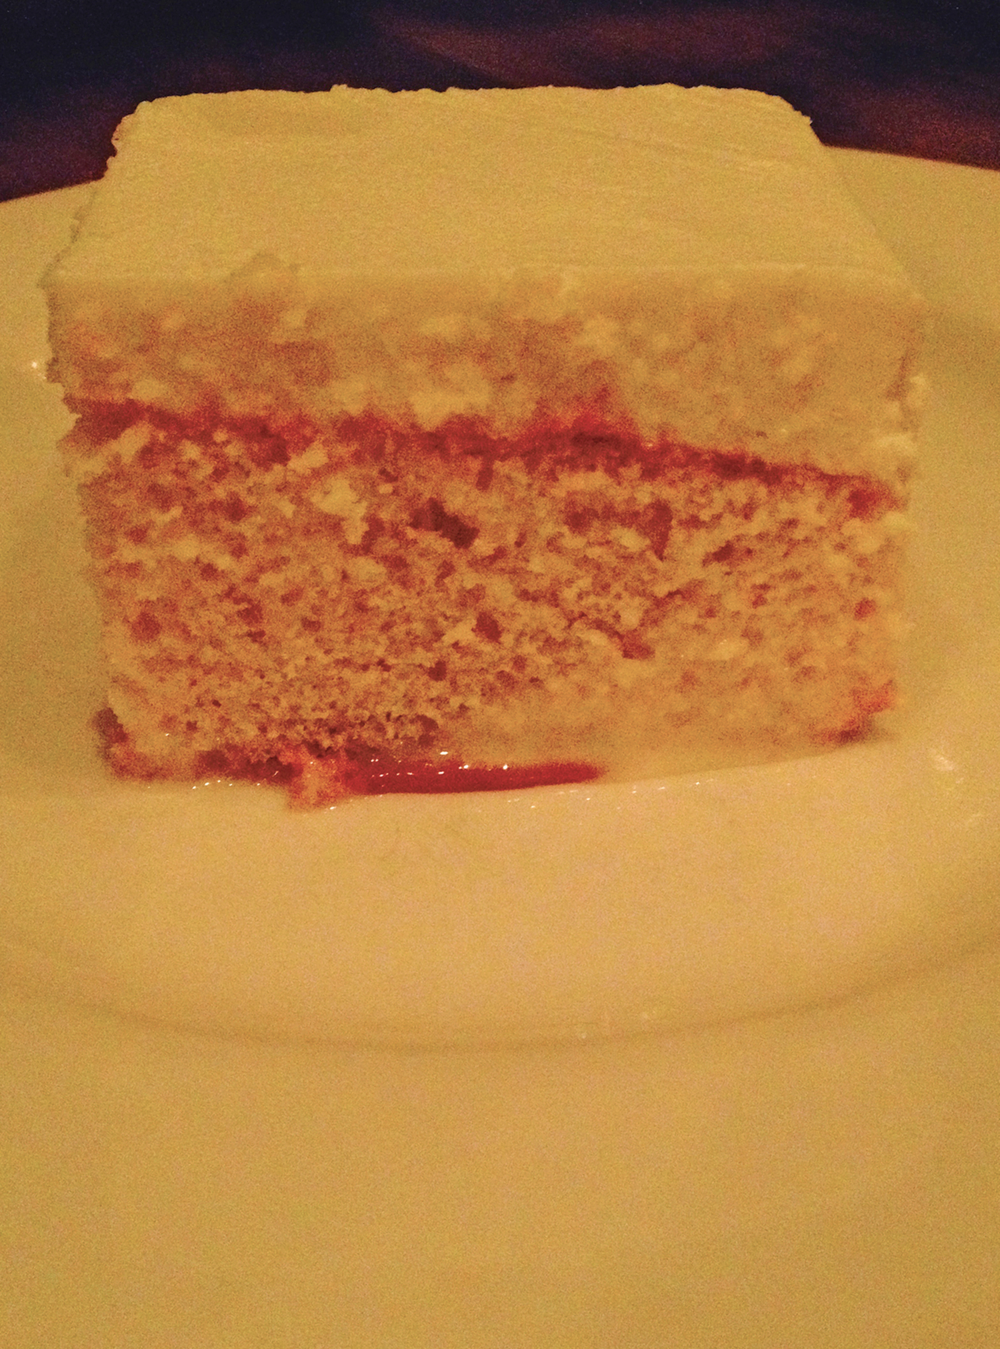 Tres leches cake with dulce de leche.